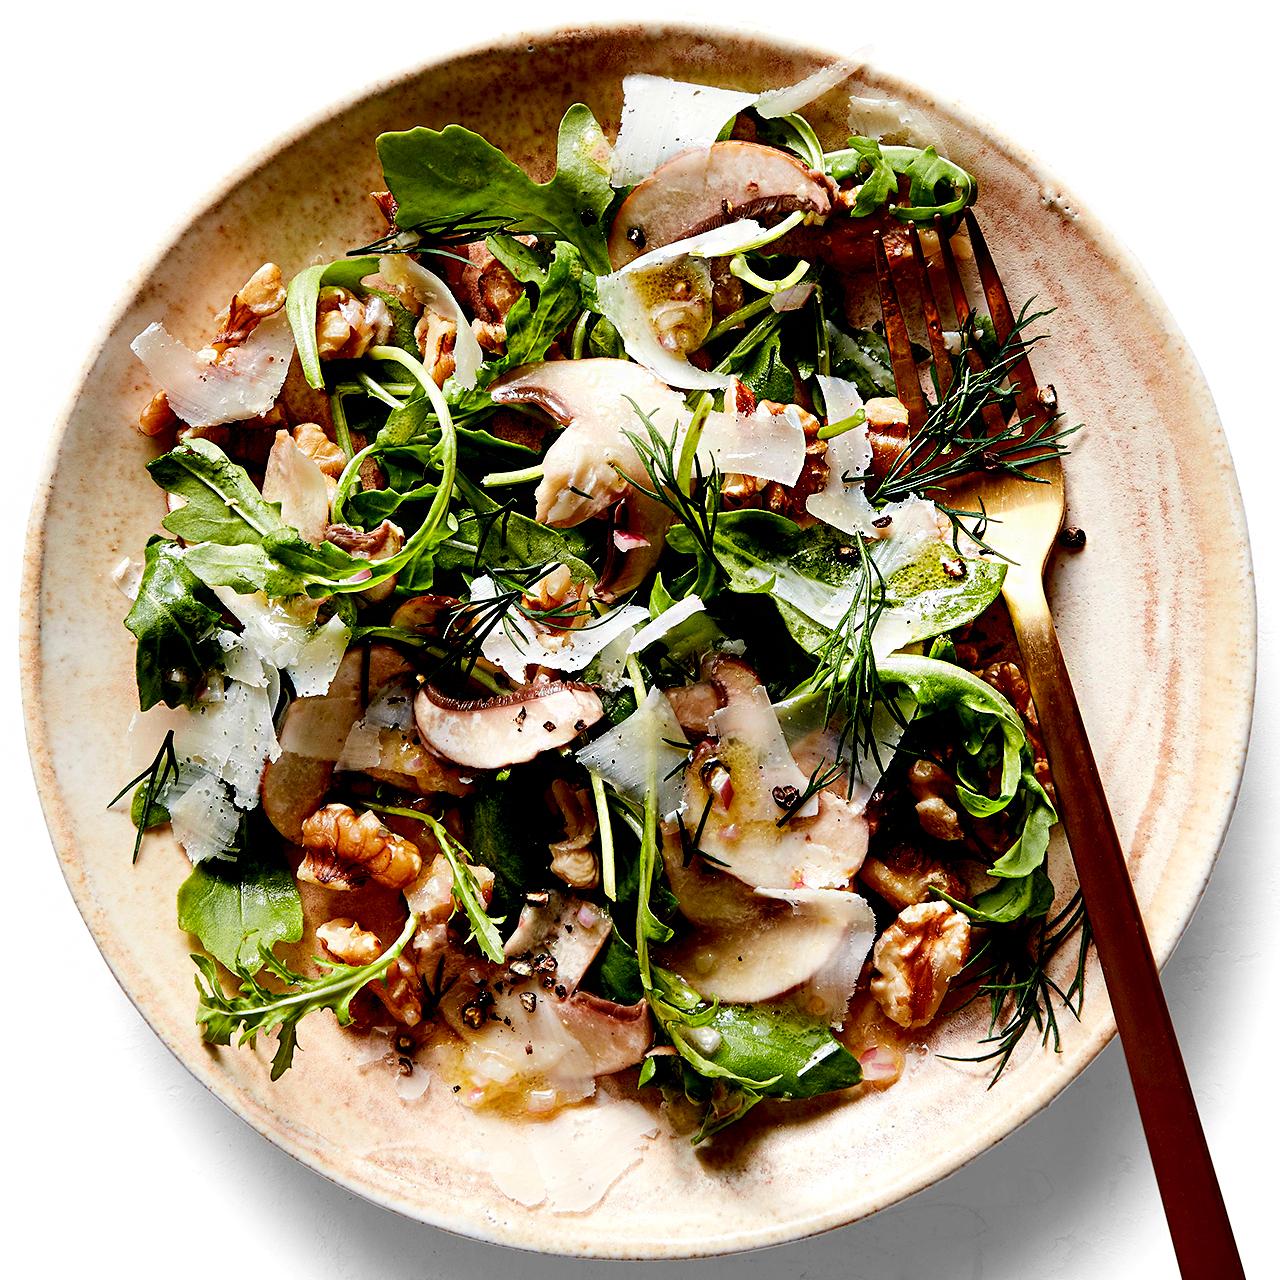 Shaved Mushroom Salad with Arugula & Walnuts